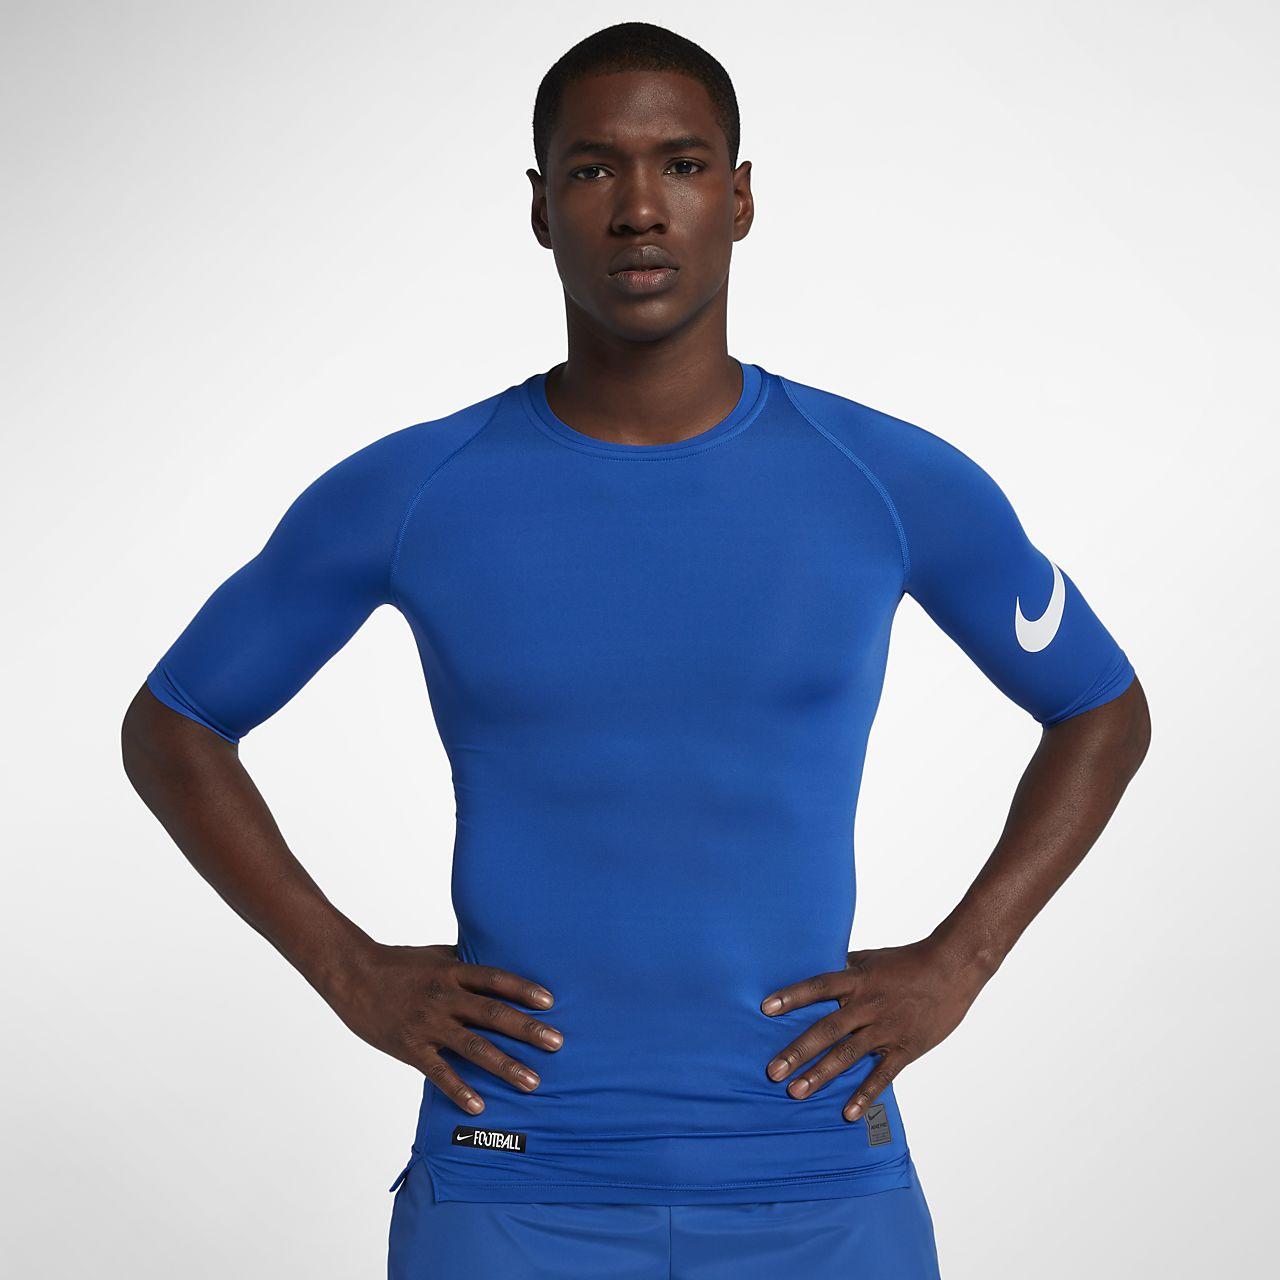 Nike Pro Men's 1/2 Sleeve Football Top